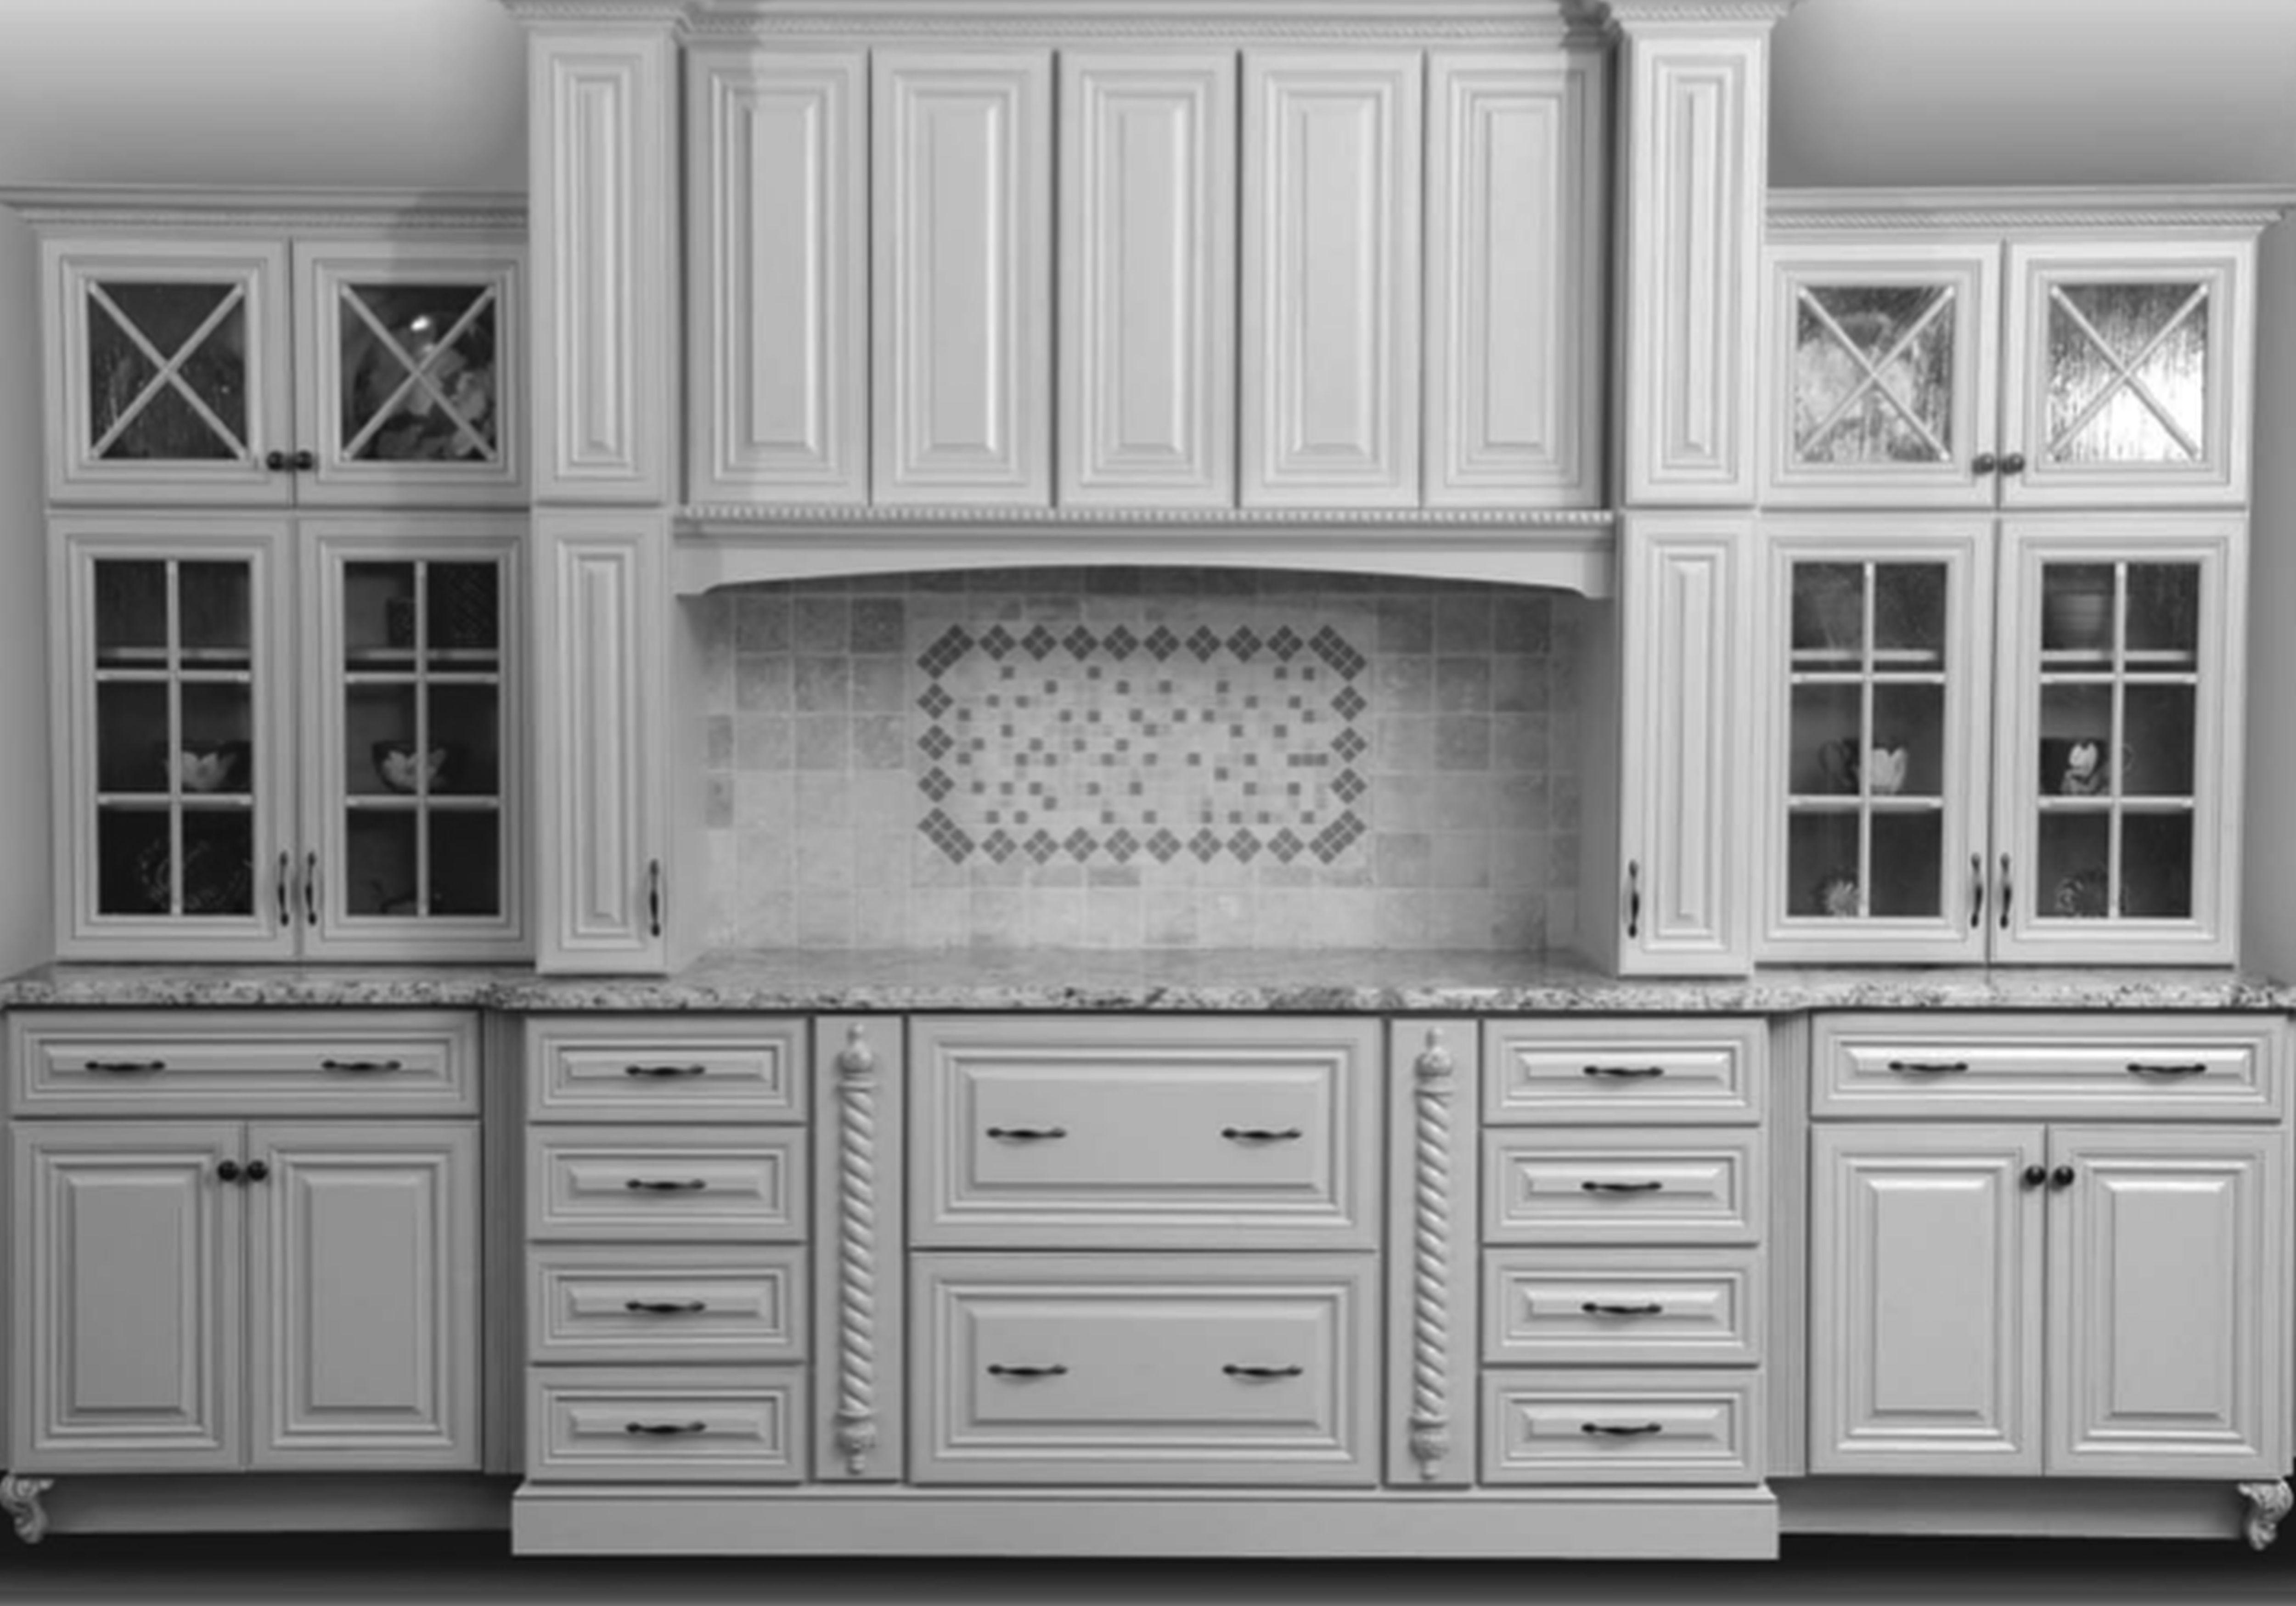 Antique White Kitchen Cabinet Ideas Brilliant Modern Tile Backsplash Ideas Kitchen Antique White